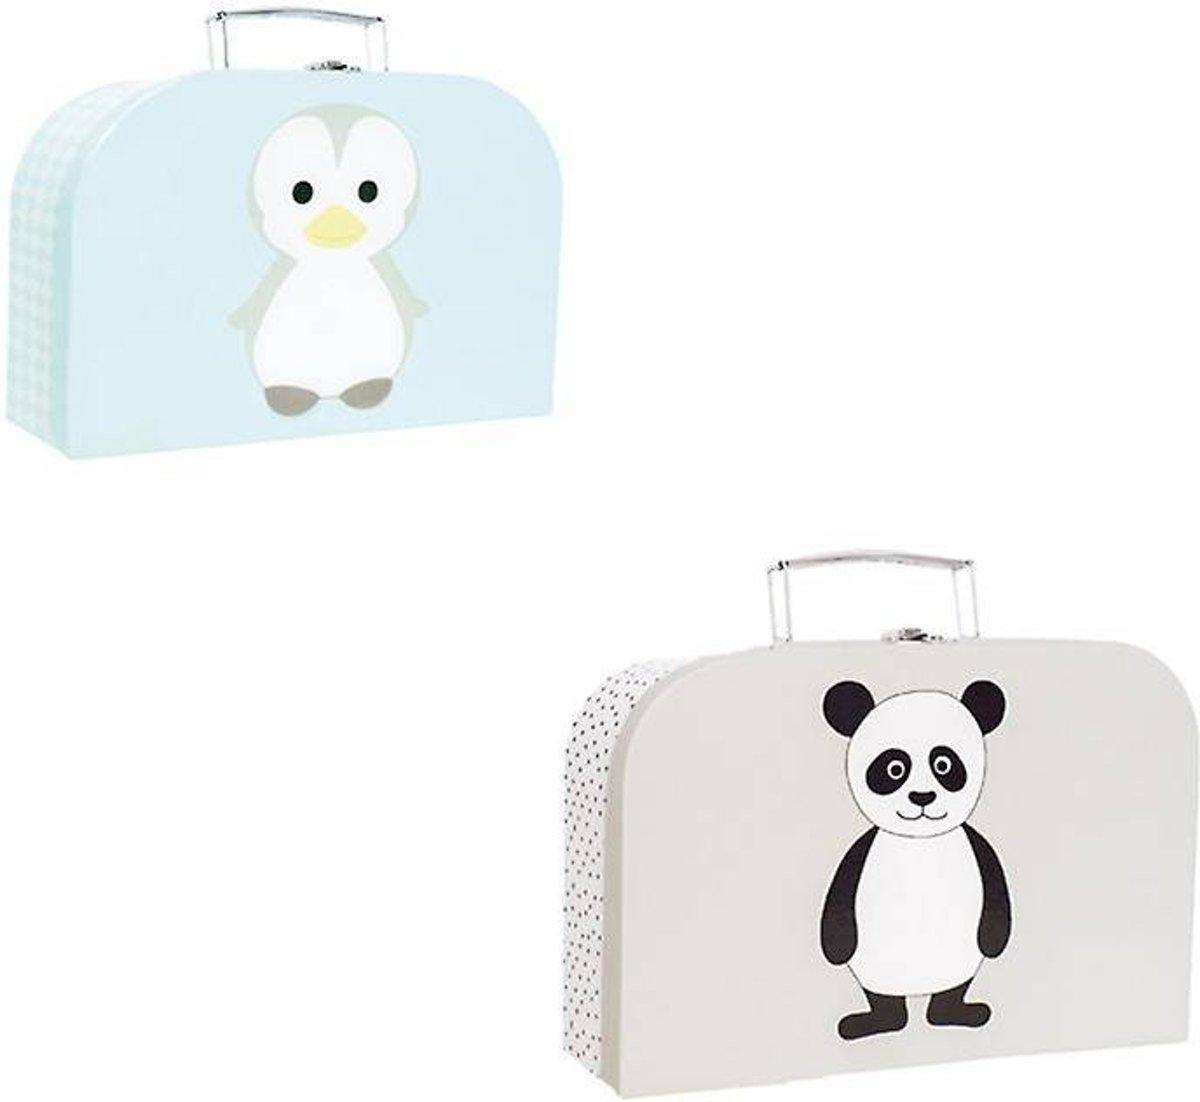 JaBaDaBaDo - Kofferset - Pinguin/panda kopen